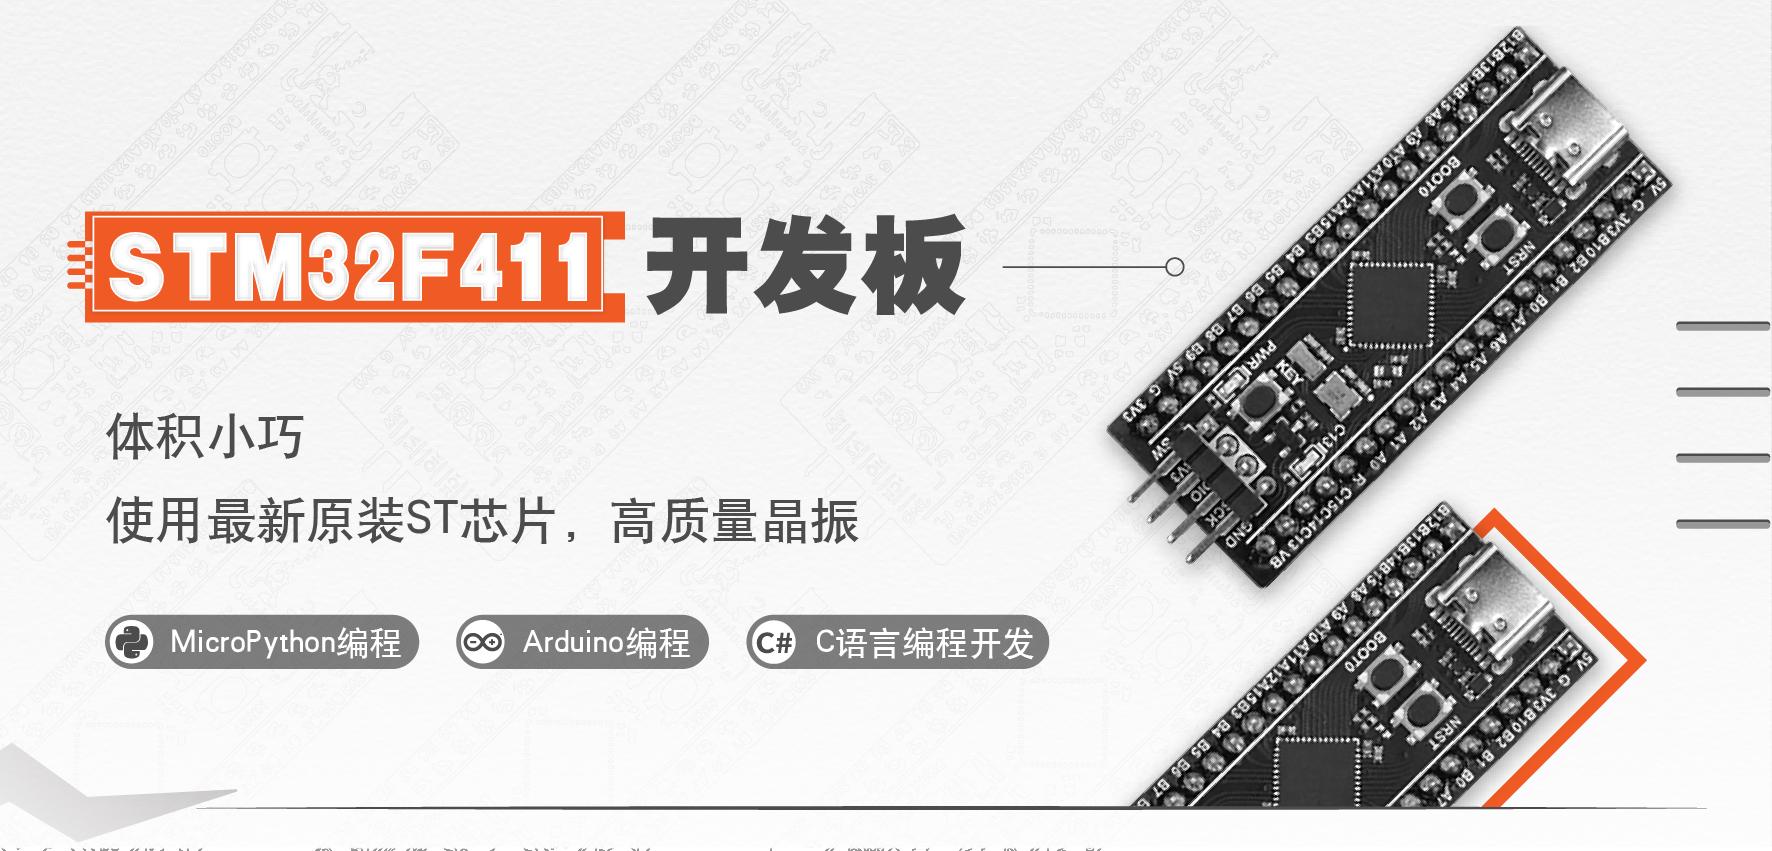 DFRobot最新创客活动-STM32F411开发板